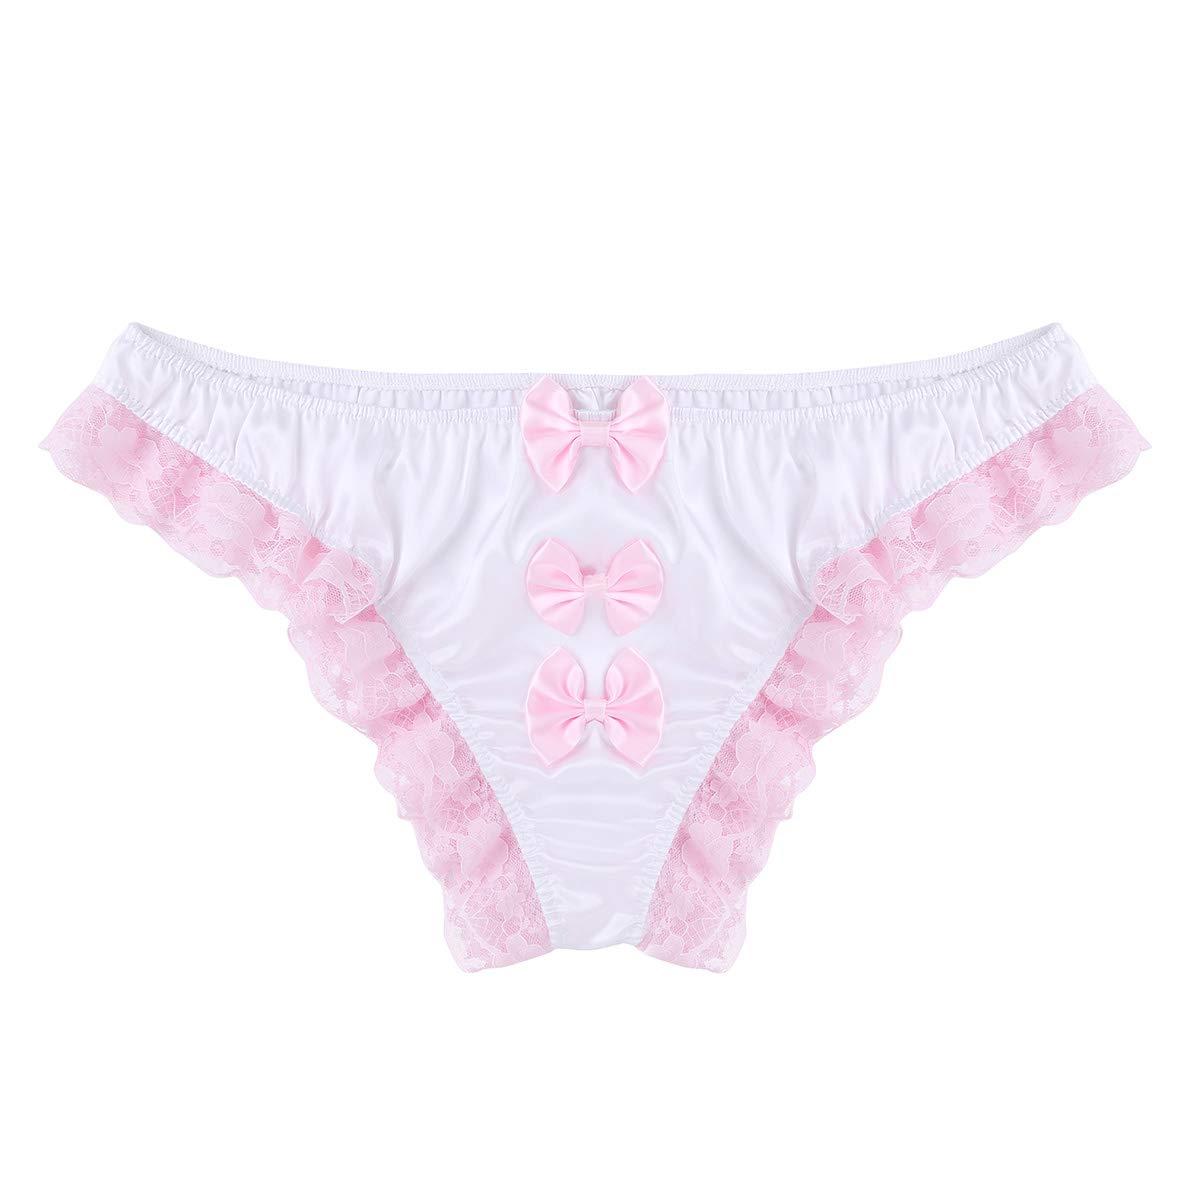 466d8fa8fd89 Agoky Mens Satin Ruffles Floral Lace Sissy Pouch Bikini Briefs Underwear  Crossdress Panties: Amazon.co.uk: Clothing